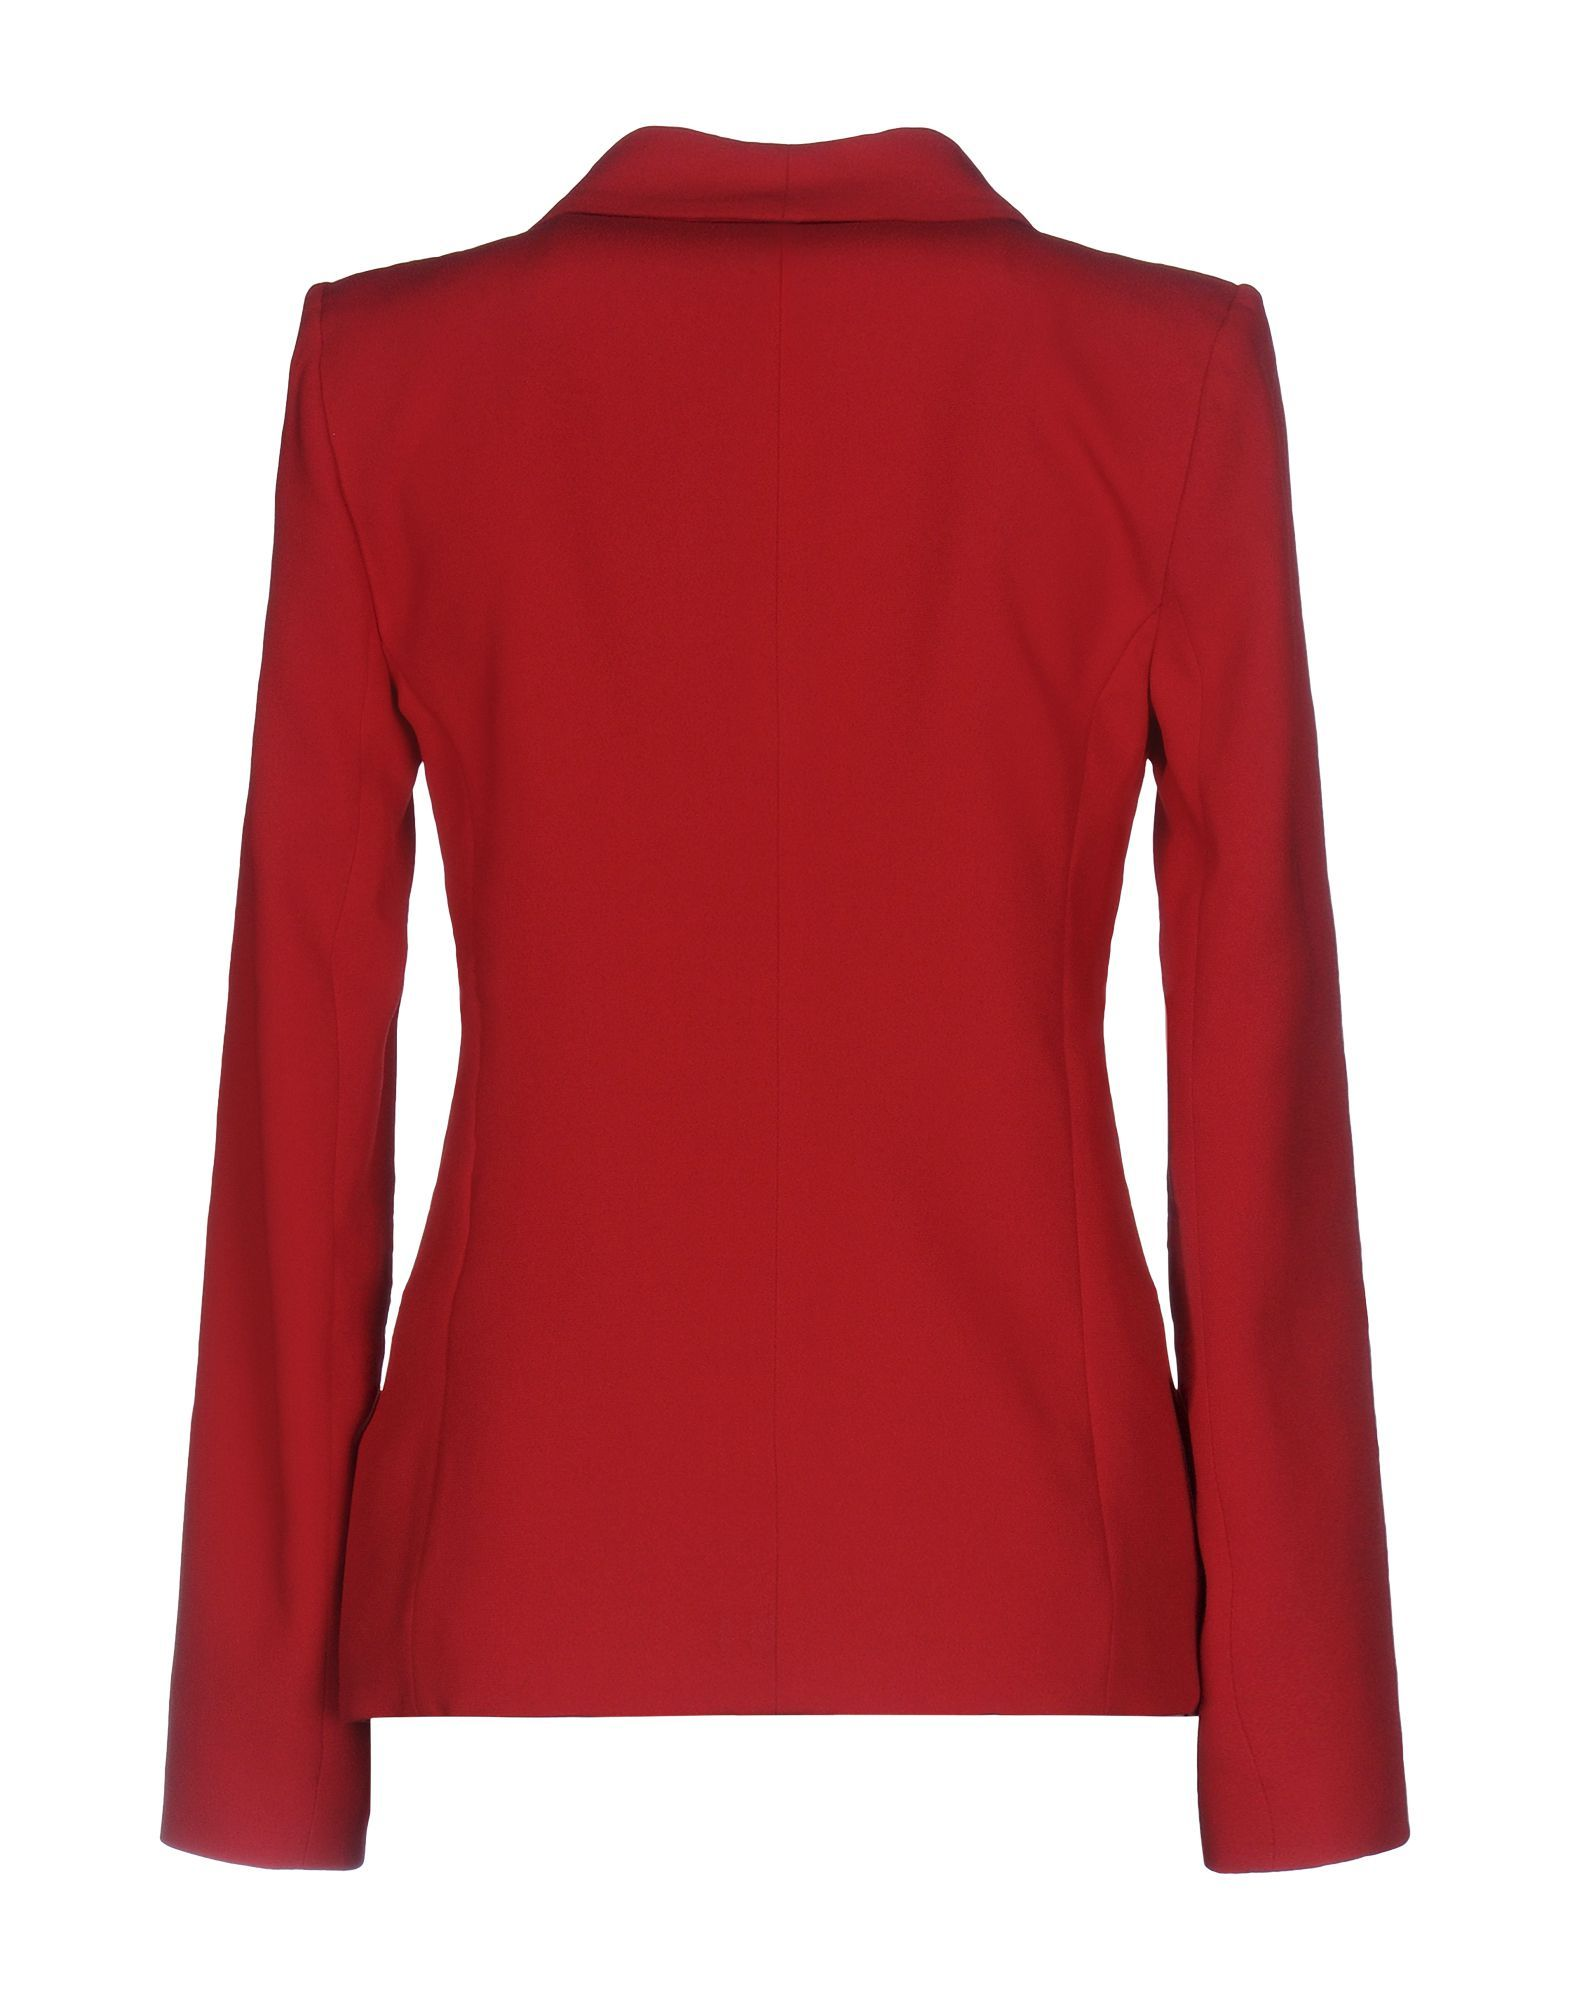 Patrizia Pepe Red Crepe Single Breasted Jacket